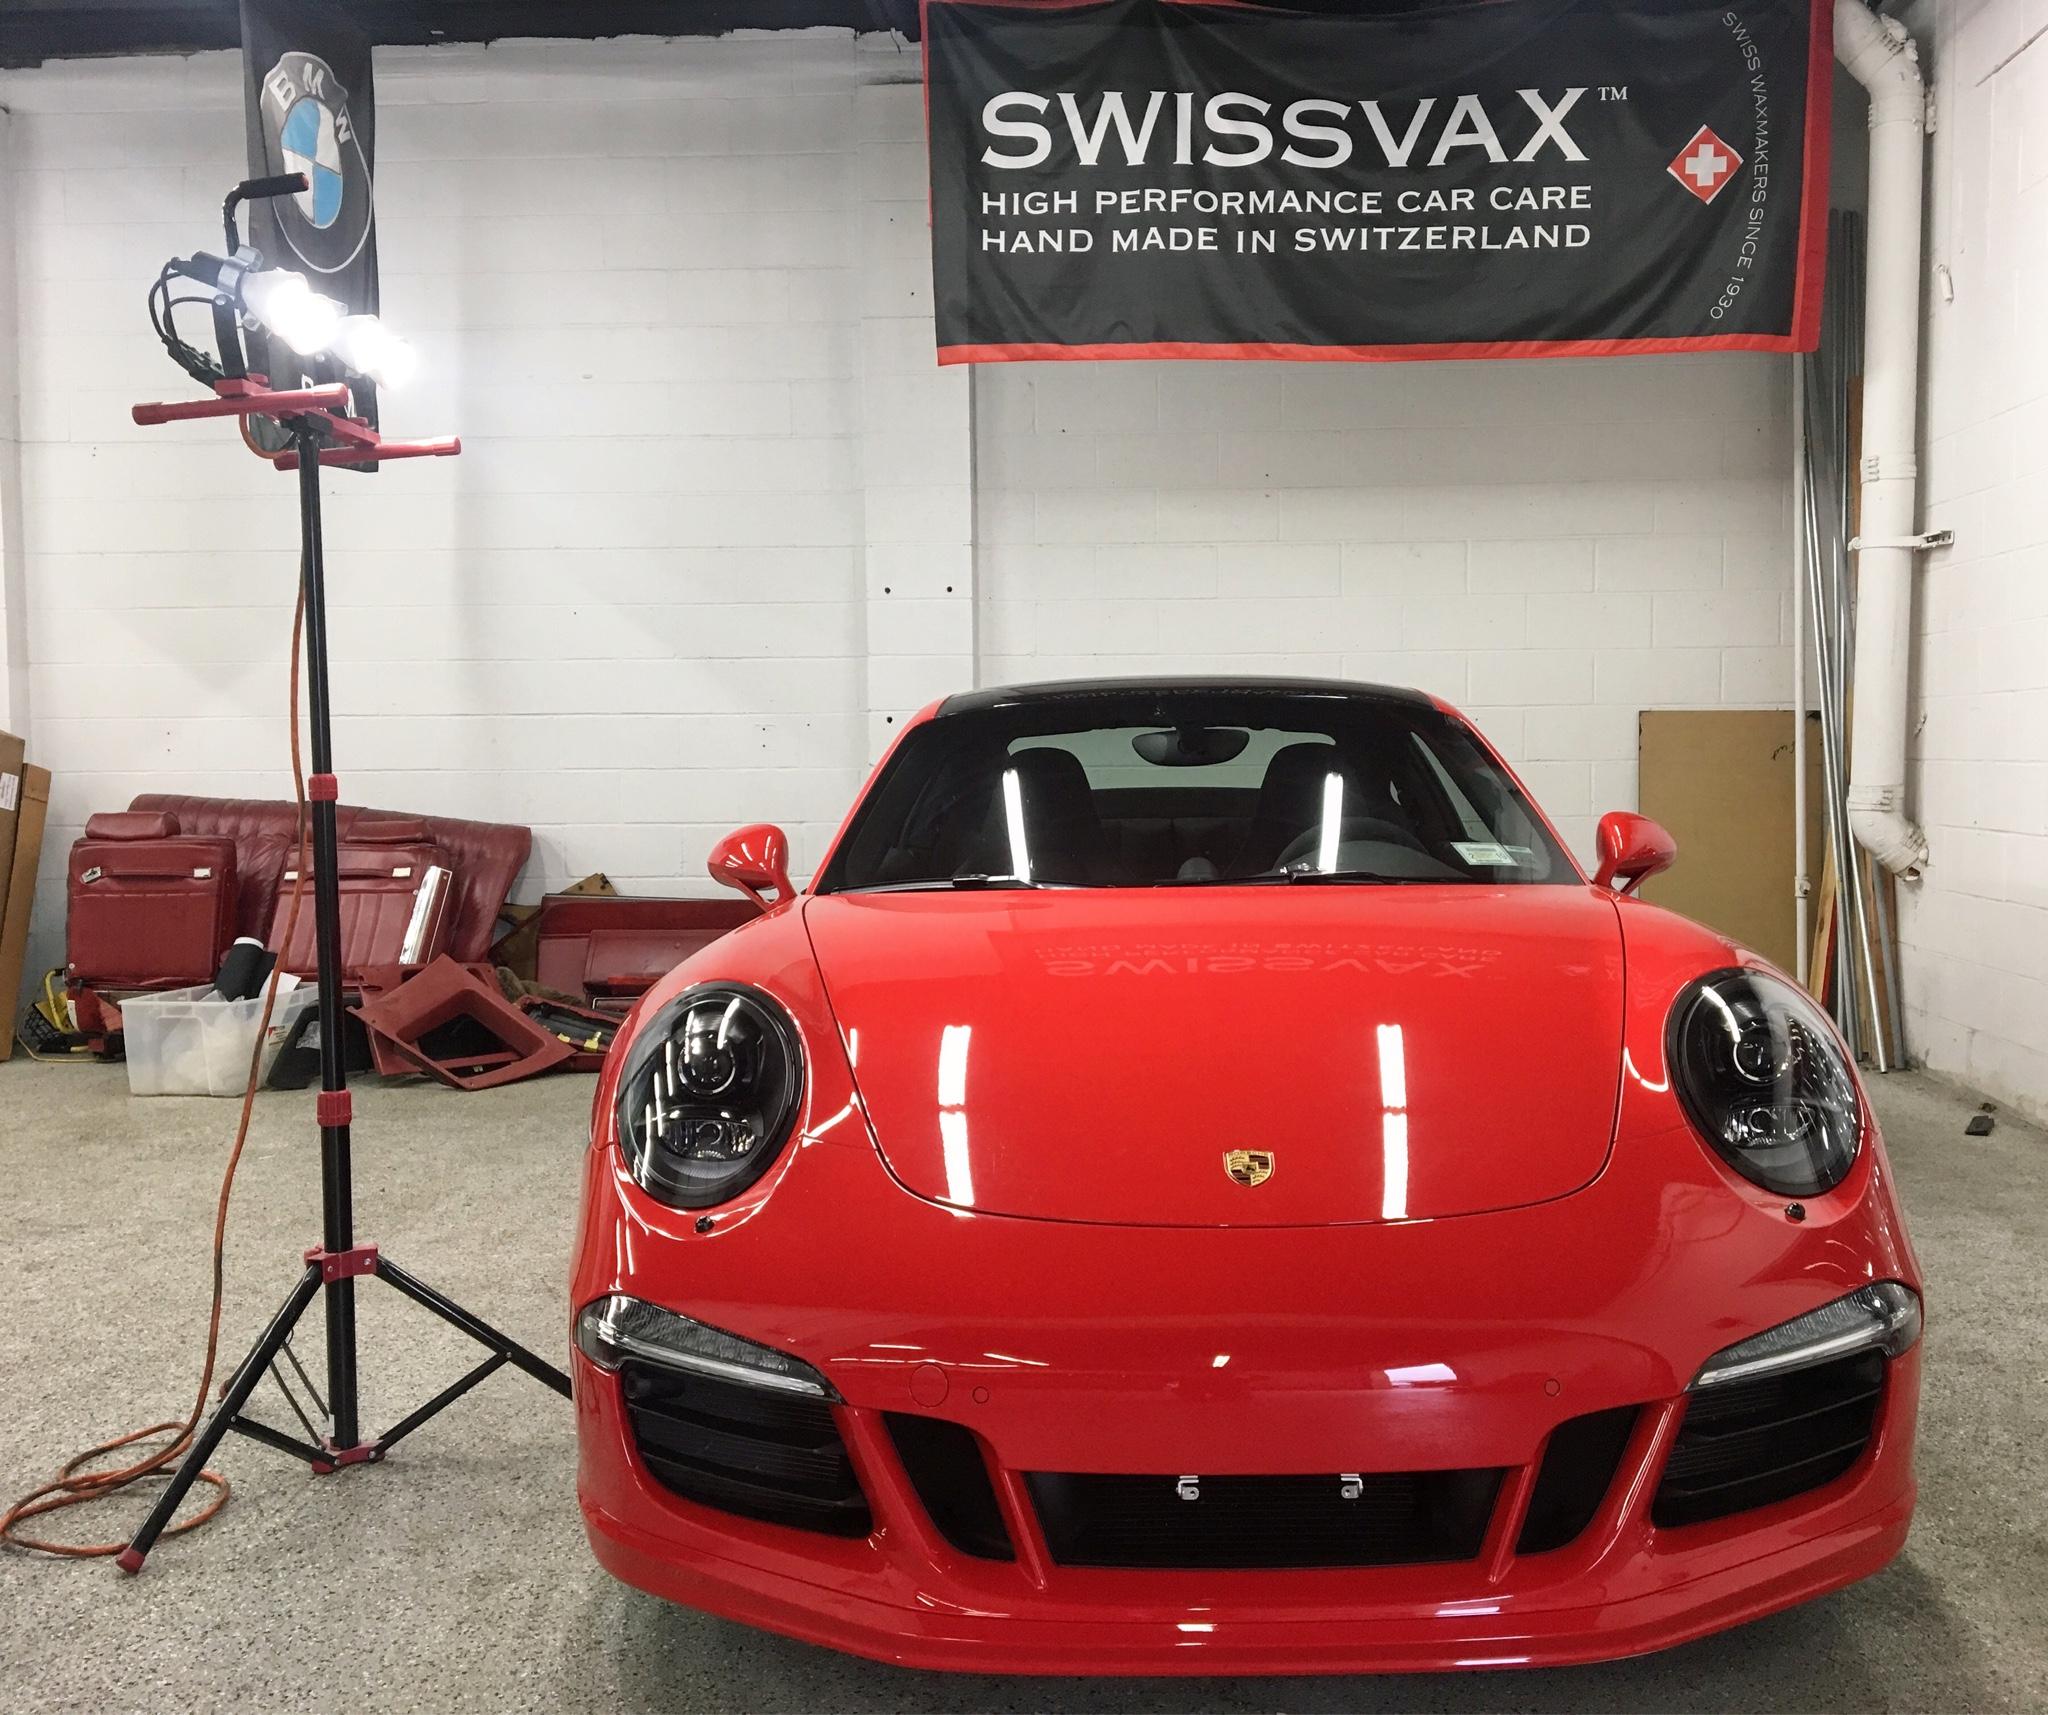 Porsche 911 Engine Test Stand: Porsche 911 Receives The CQuartz Professional Treatment